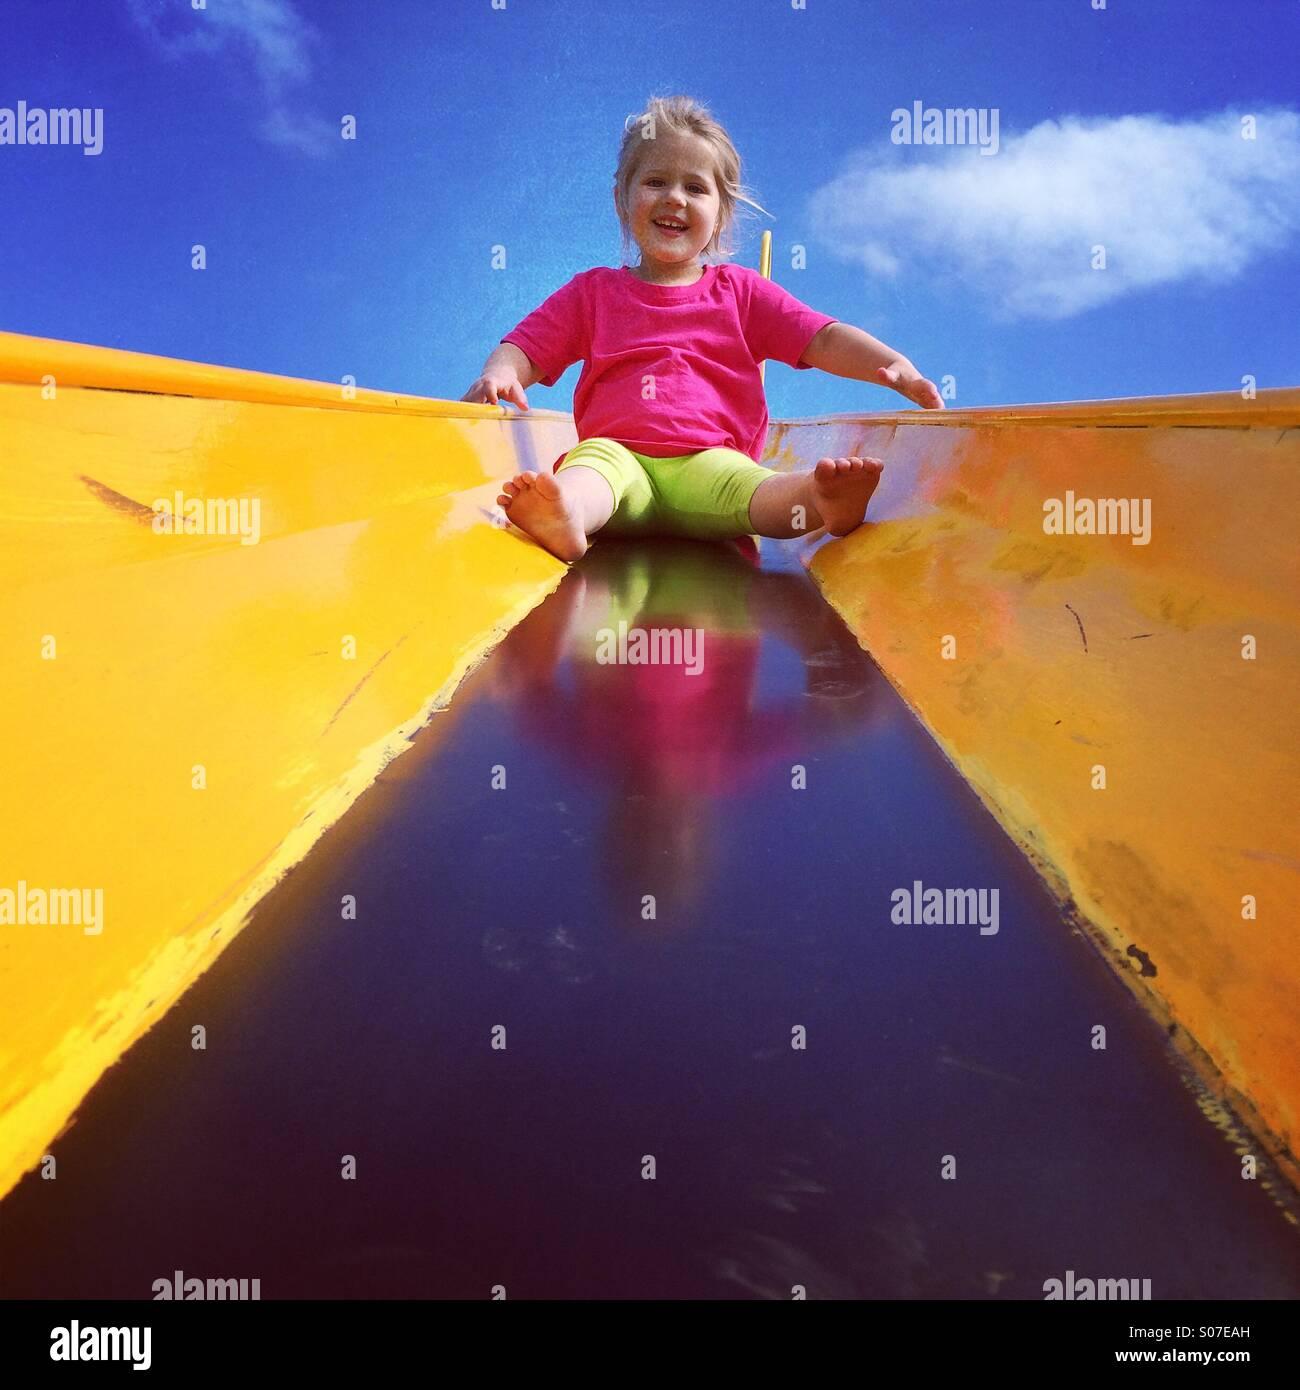 Play park - Stock Image